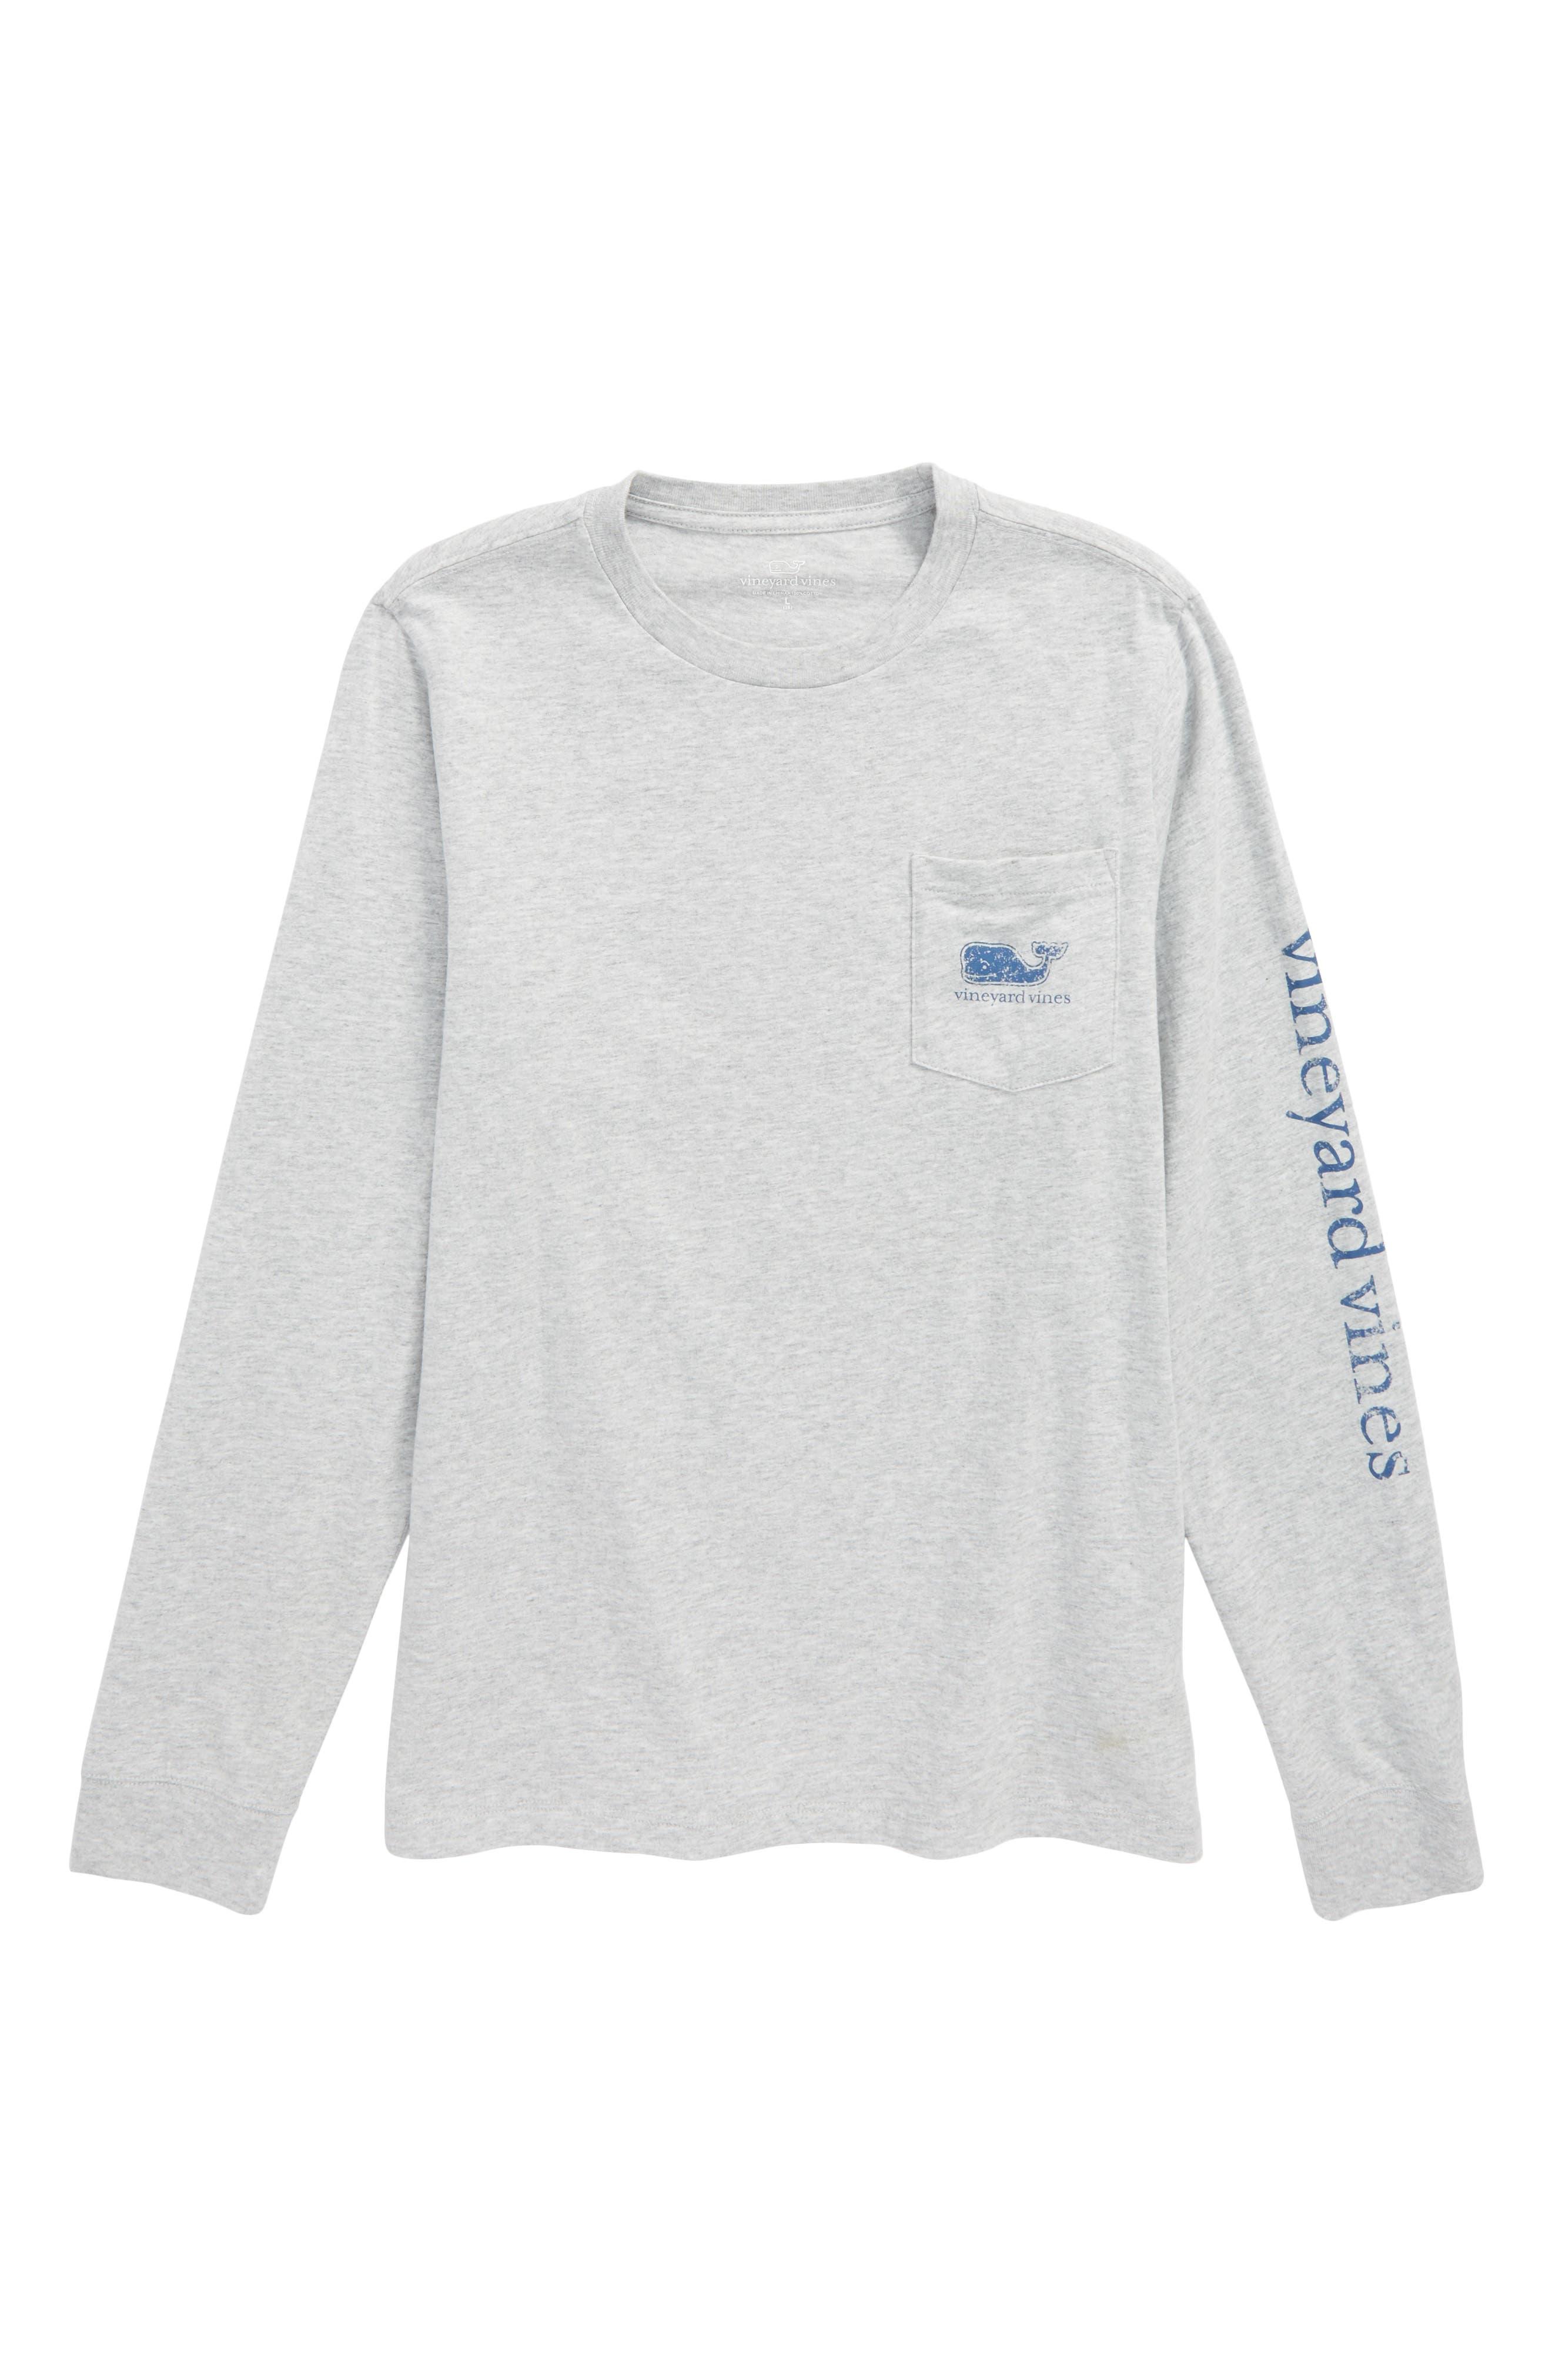 Vintage Whale Pocket T-Shirt,                             Main thumbnail 1, color,                             Gray Heather